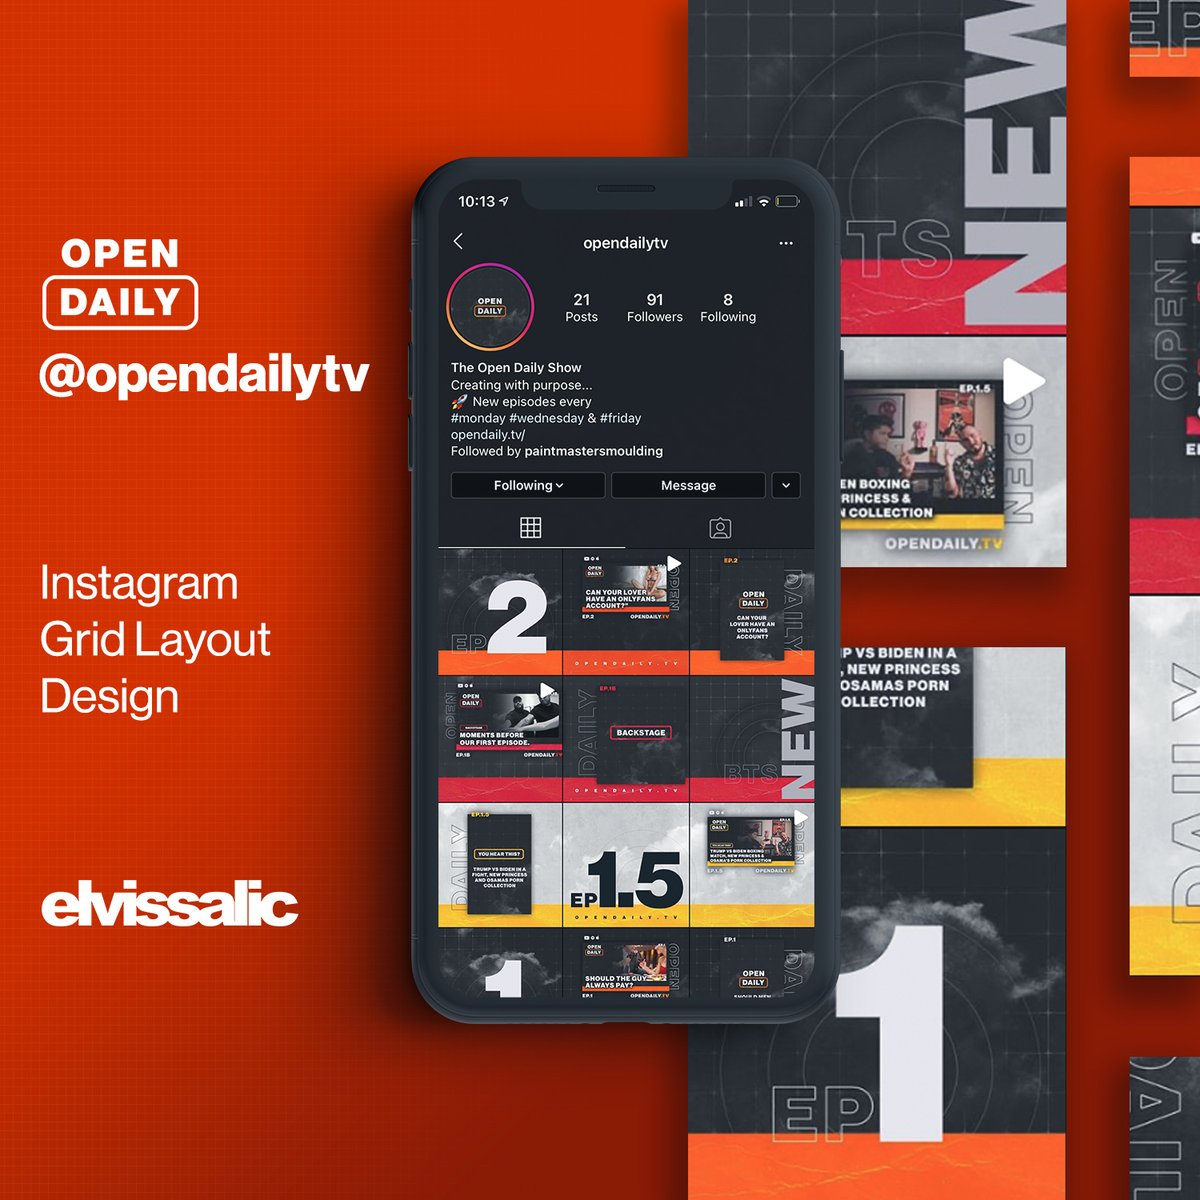 Instagram grid layout design for @opendailytv  #graphic #design #graphicdesign #instagram #promotion #grid #promo #socialmedia #barber #photoshop #designforhire #podcast #instagramwall #walldesign #digitaldesigns https://t.co/LZfXsRSaam